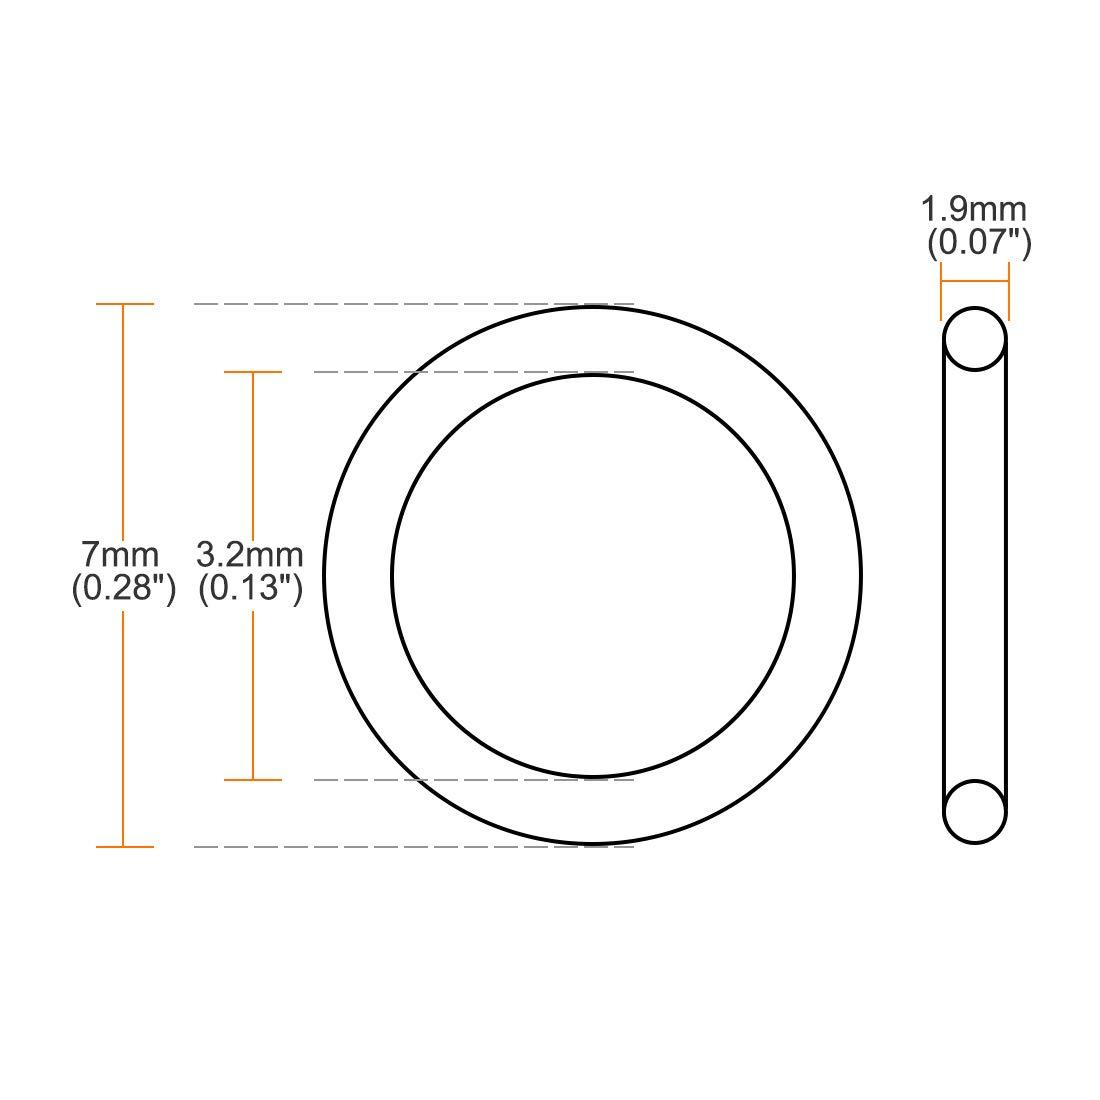 Seal Gasket Black 25Pcs 1.5mm Width uxcell Fluorine Rubber O Rings 1.5mm Inner Diameter 4.5mm OD